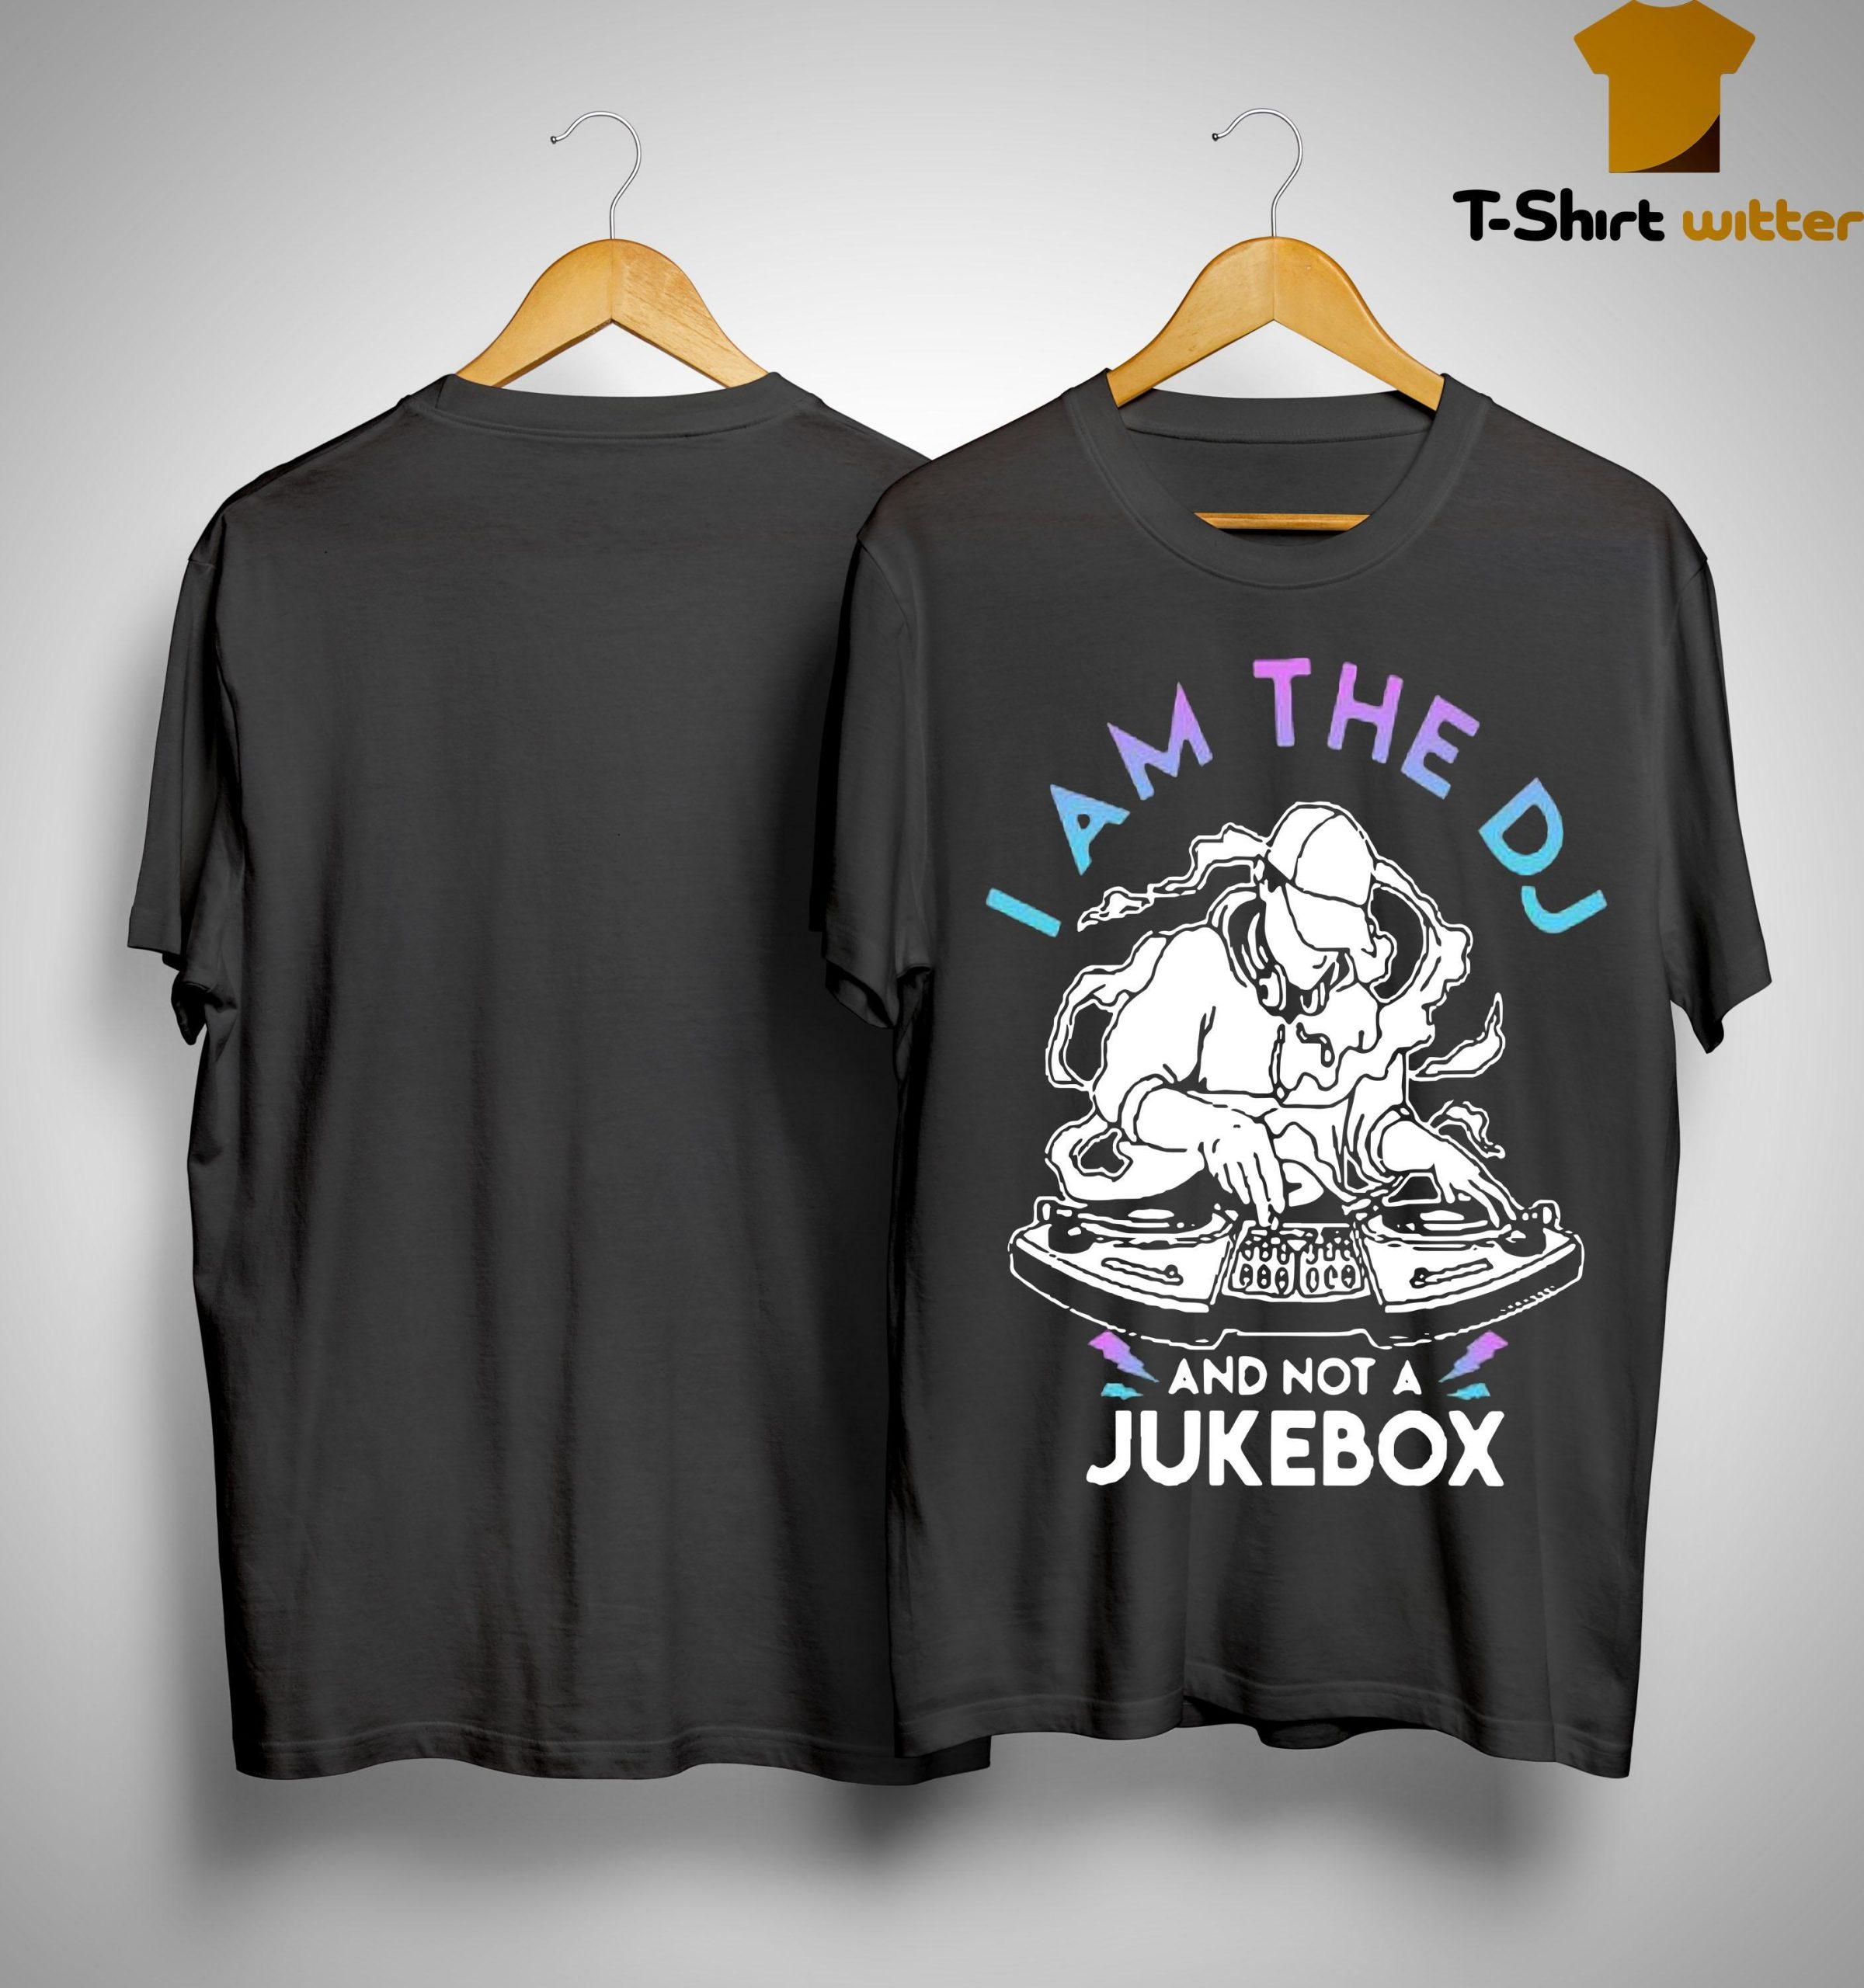 I Am The Dj And Not A Jukebox Shirt